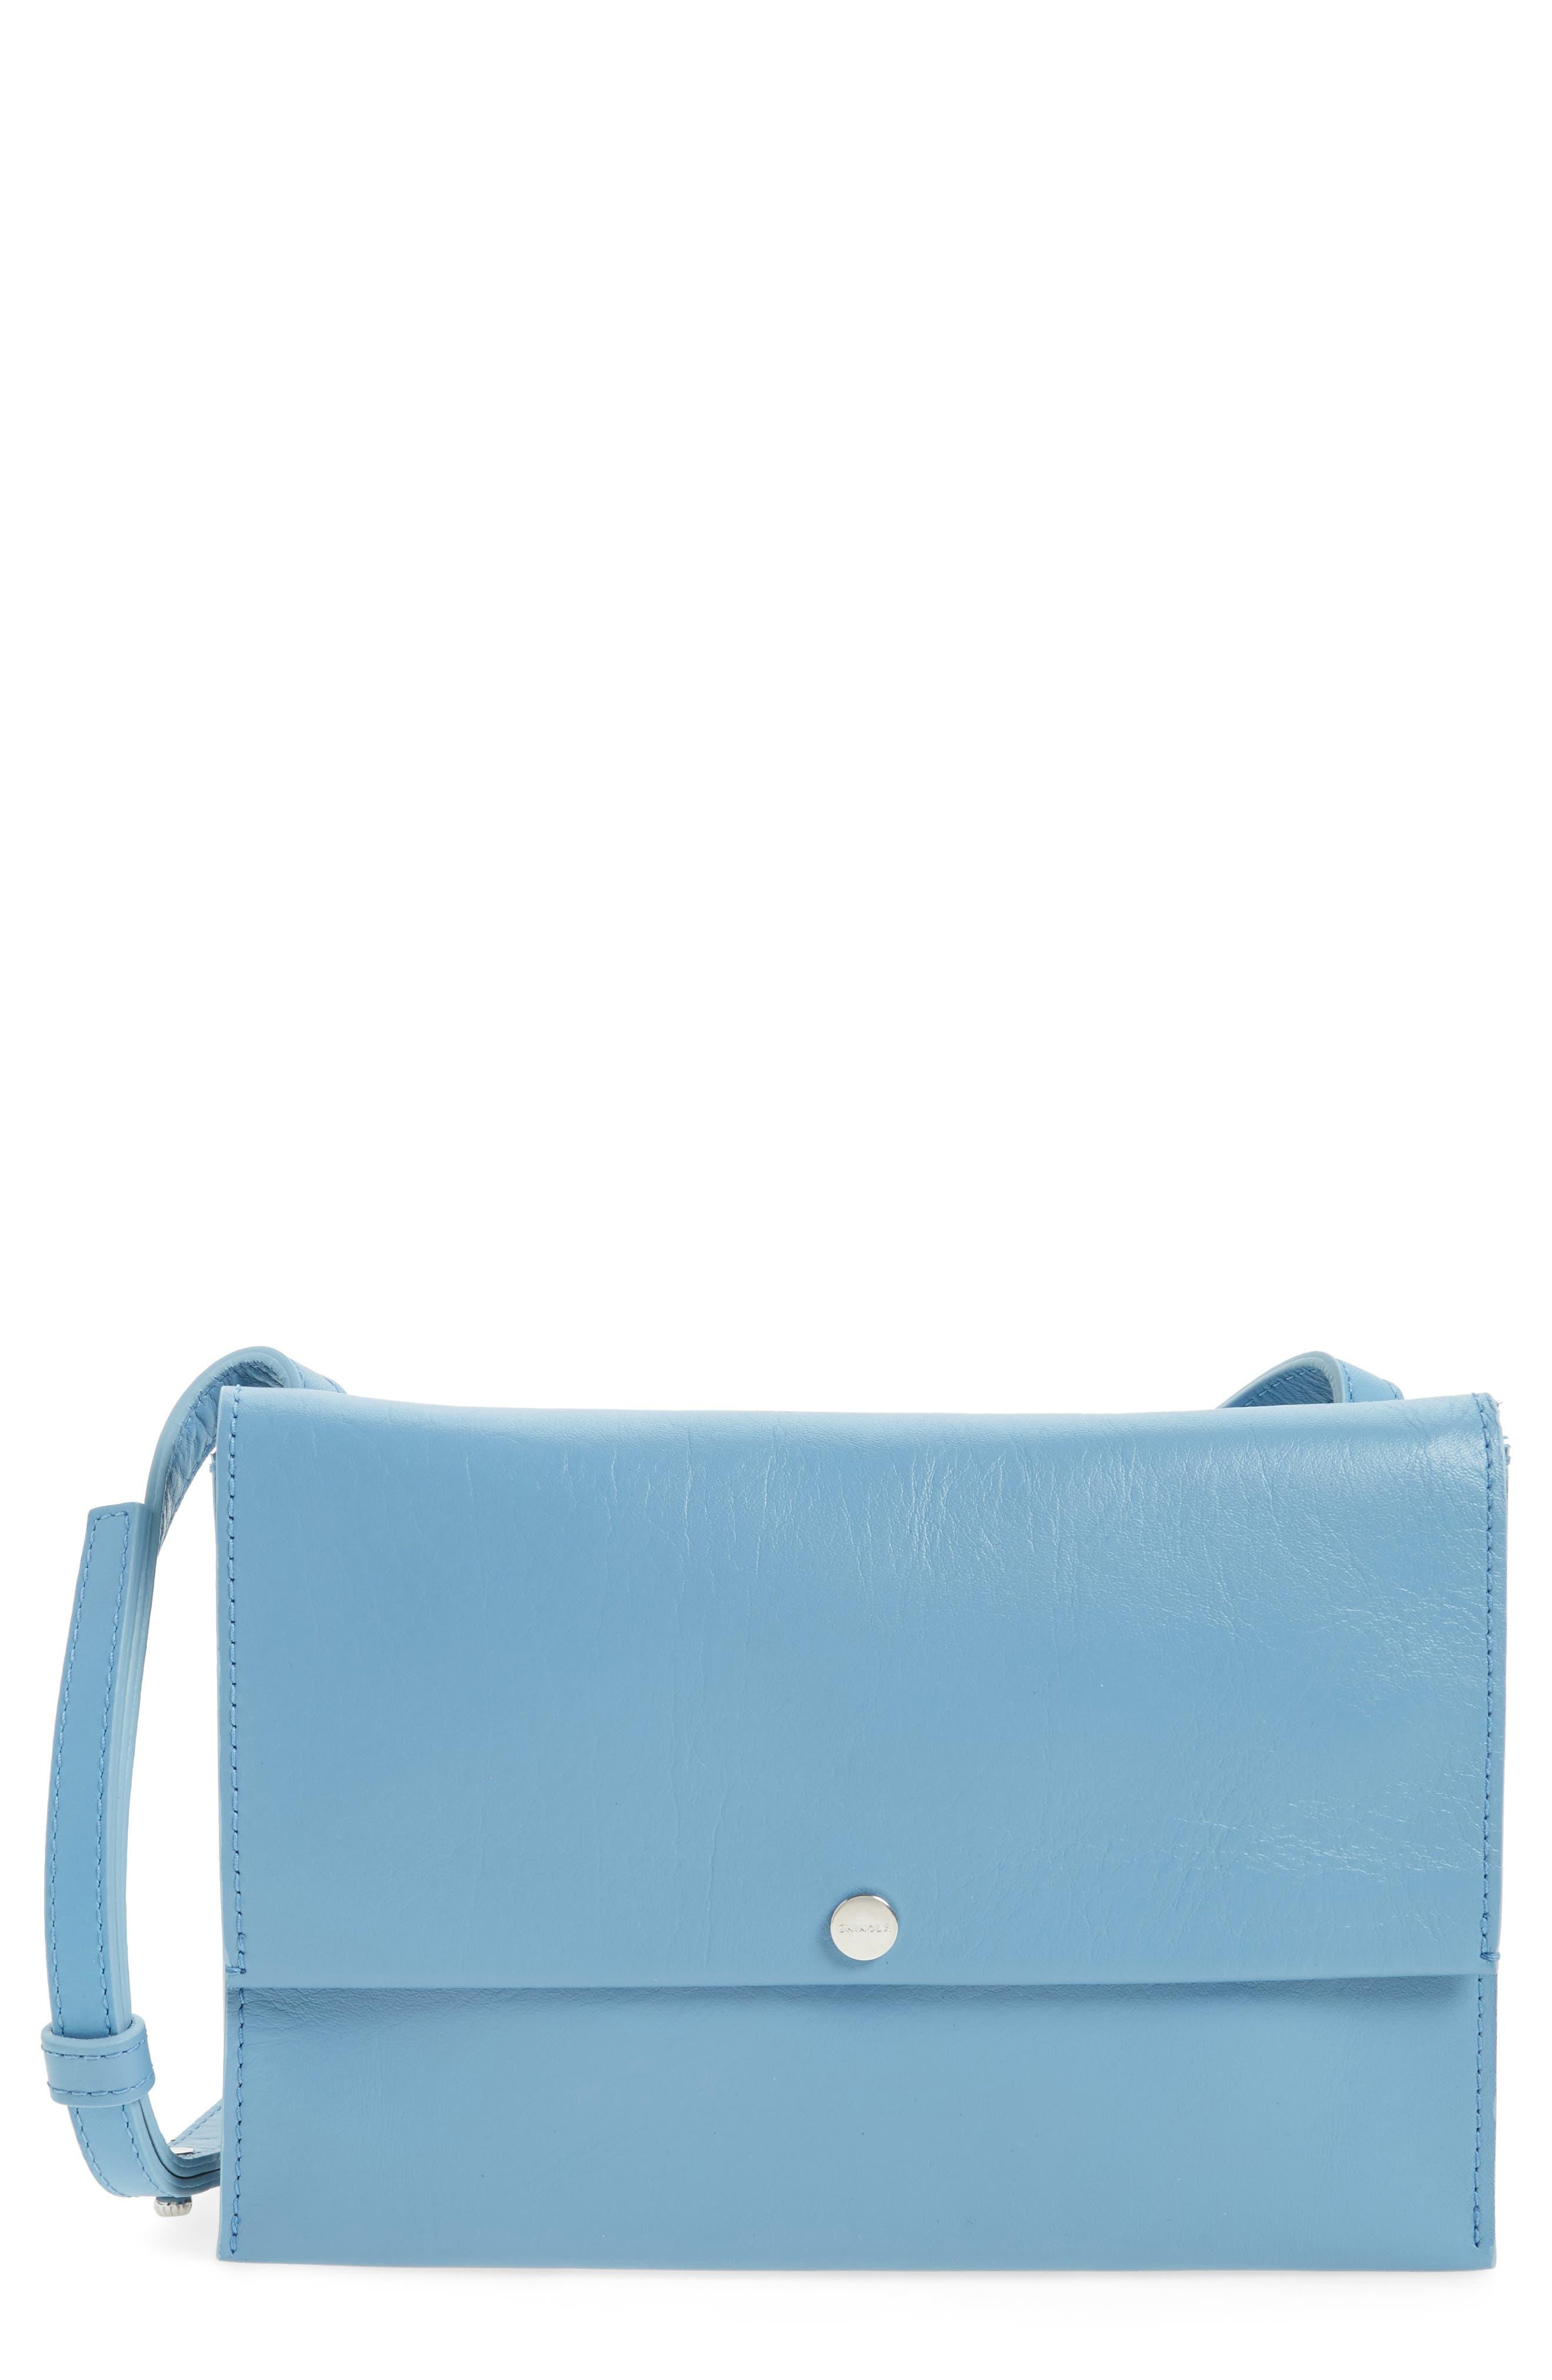 Main Image - Shinola Crossbody Leather Bag